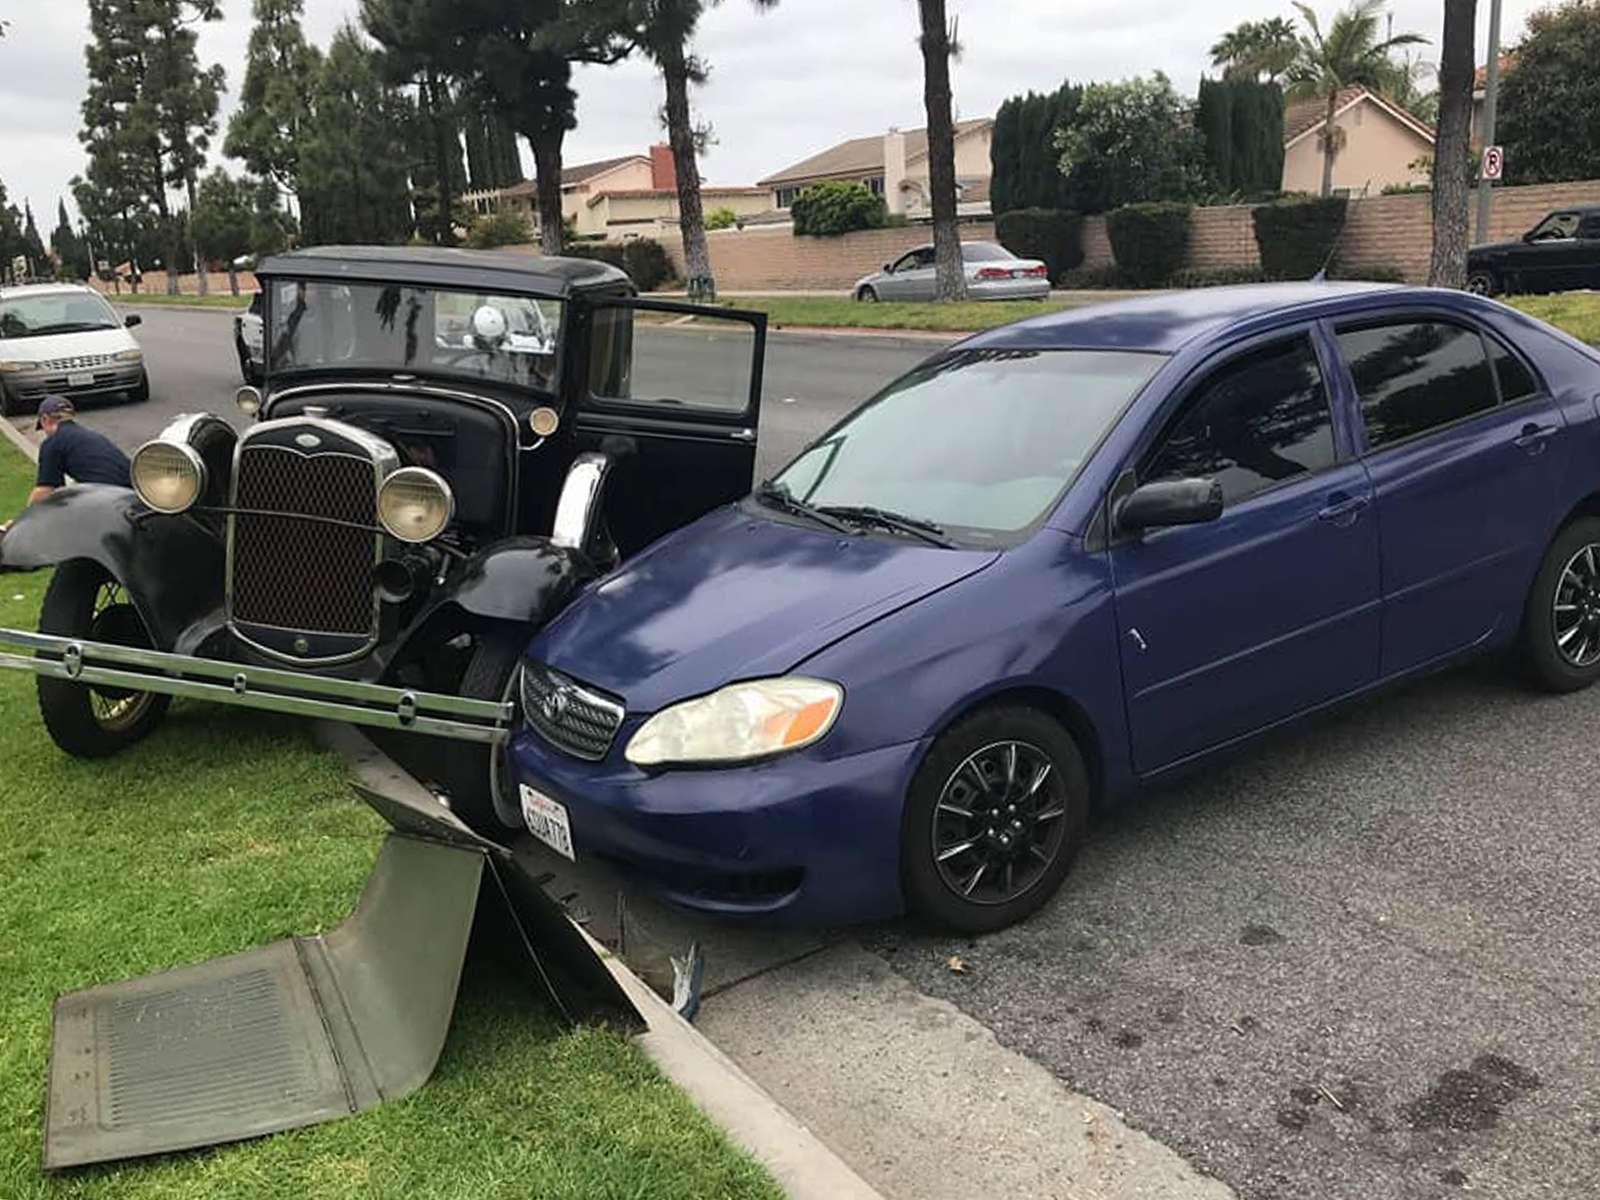 Ford Mustang vděč za své jméno rozvodu